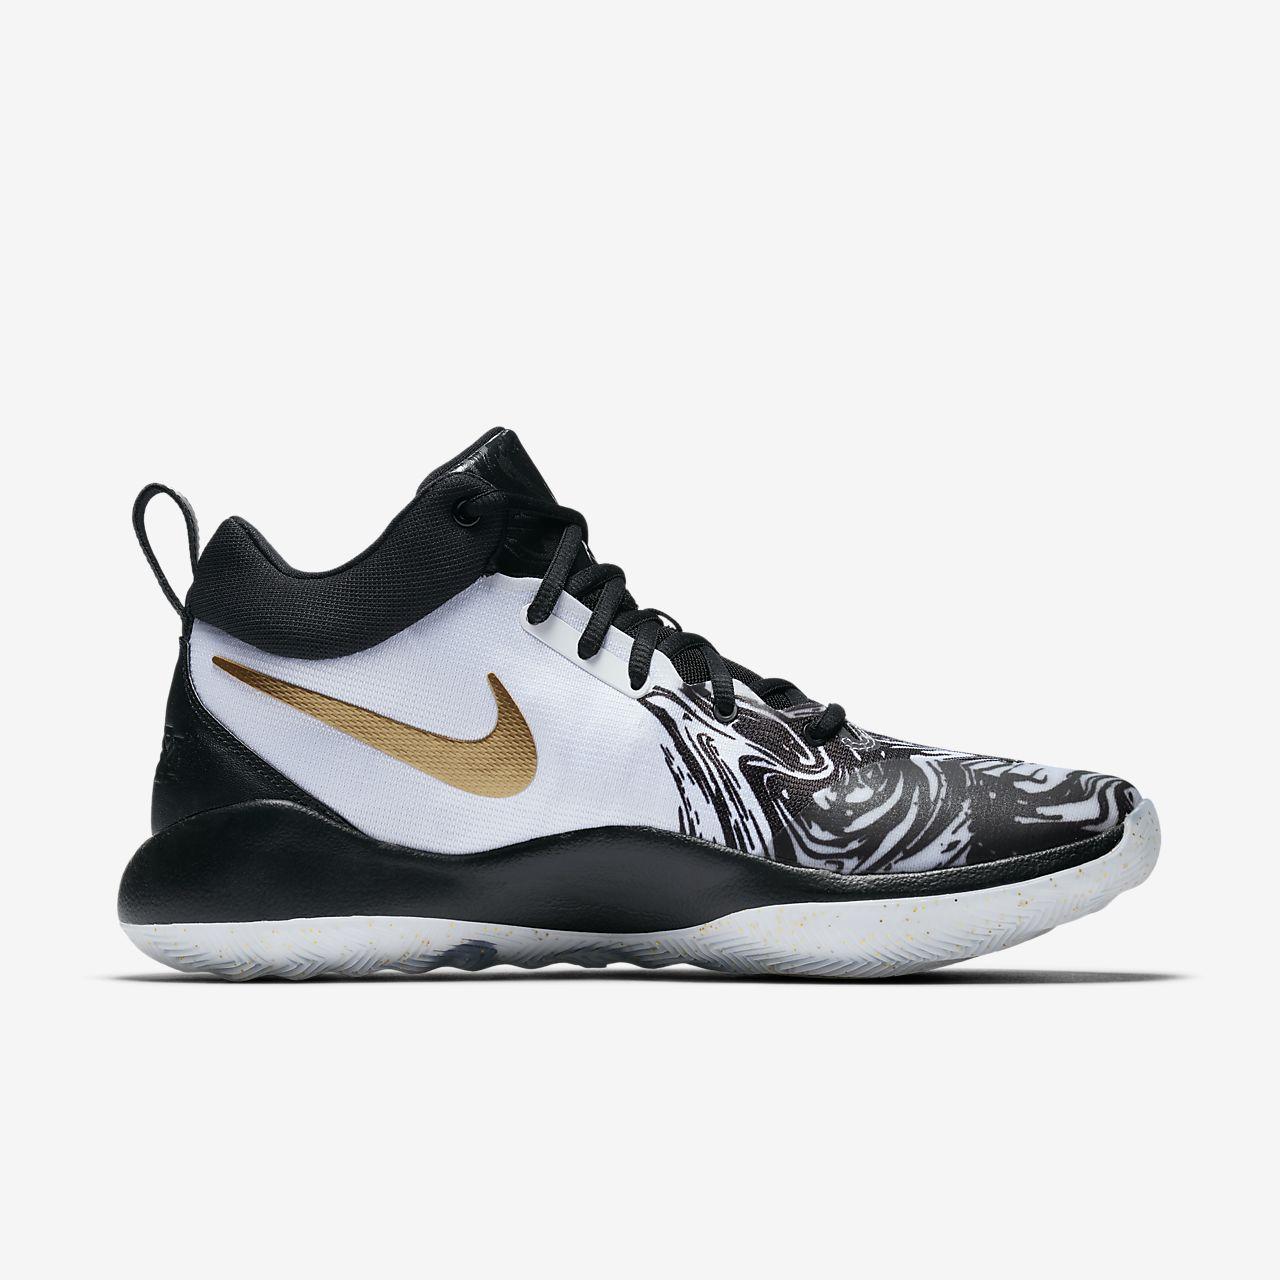 nike basketball boots nike performance basketball shoes